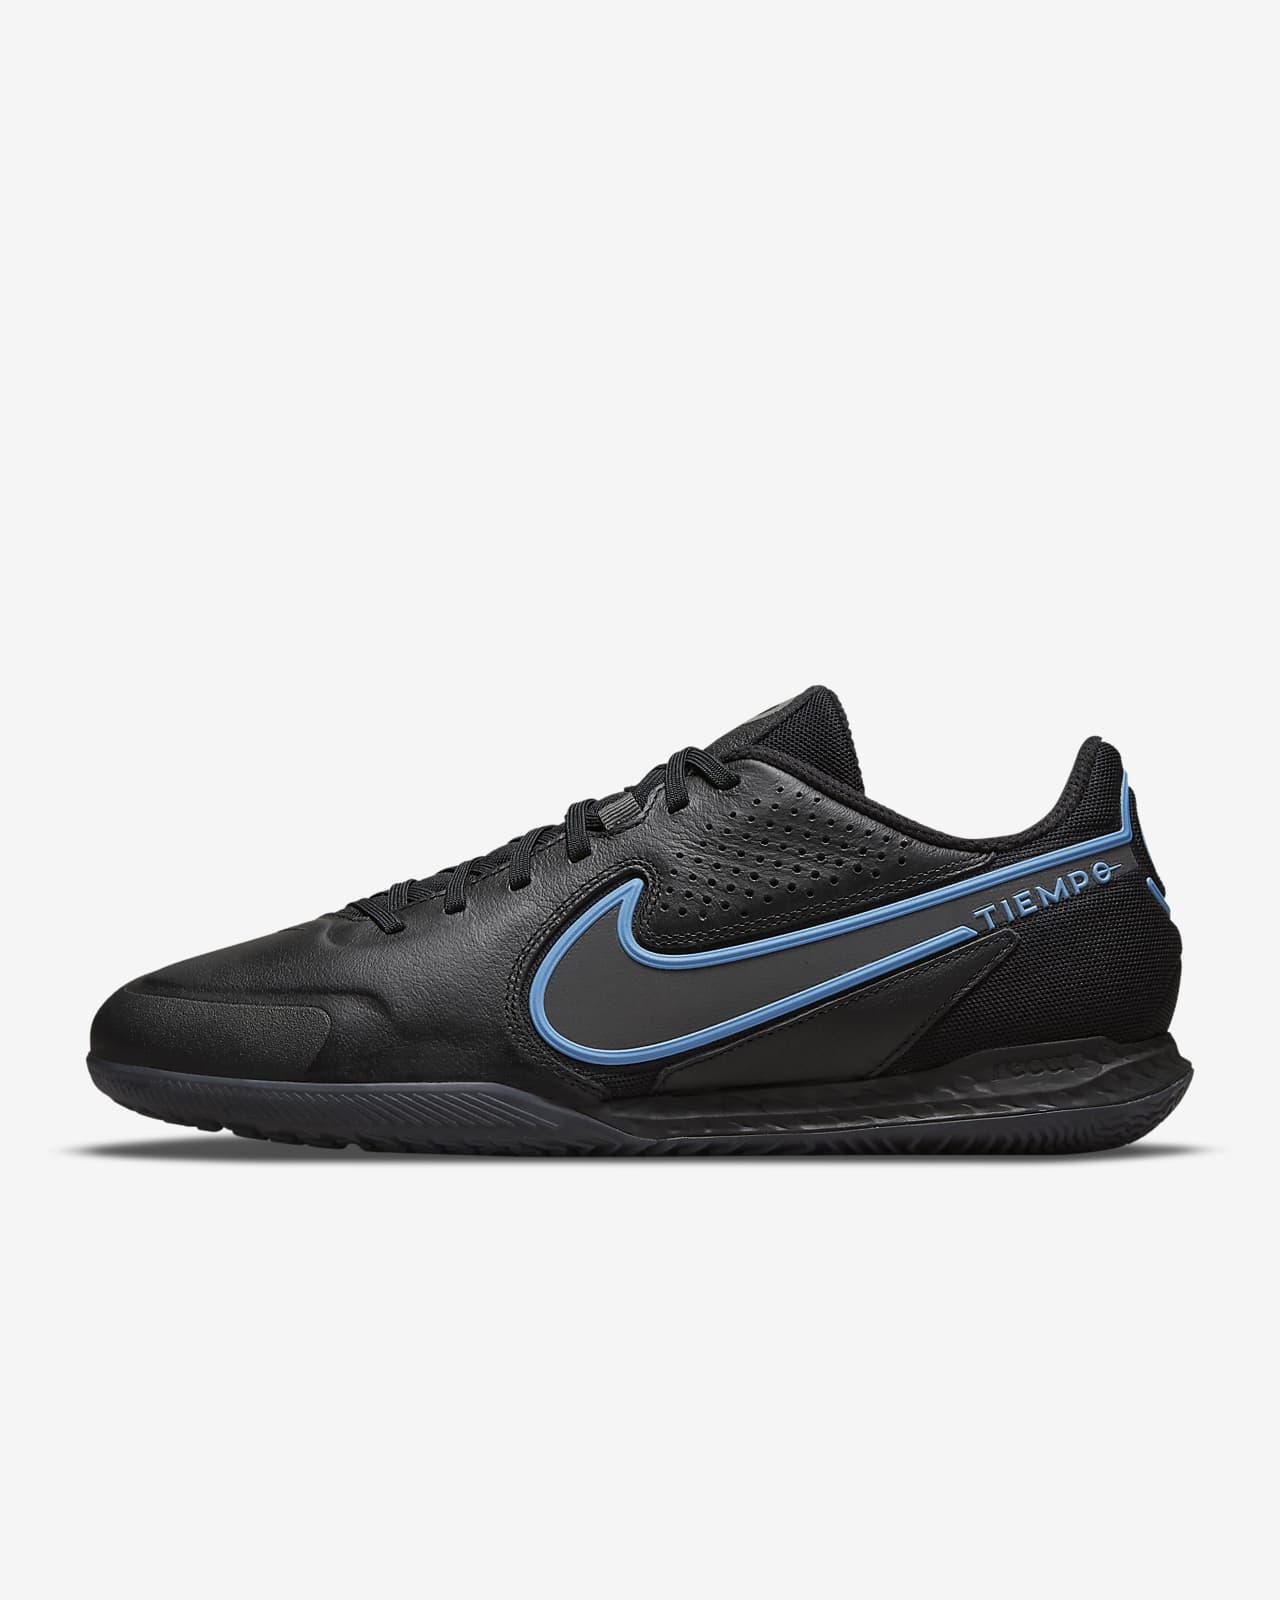 Nike React Tiempo Legend 9 Pro IC Indoor/Court Football Shoe